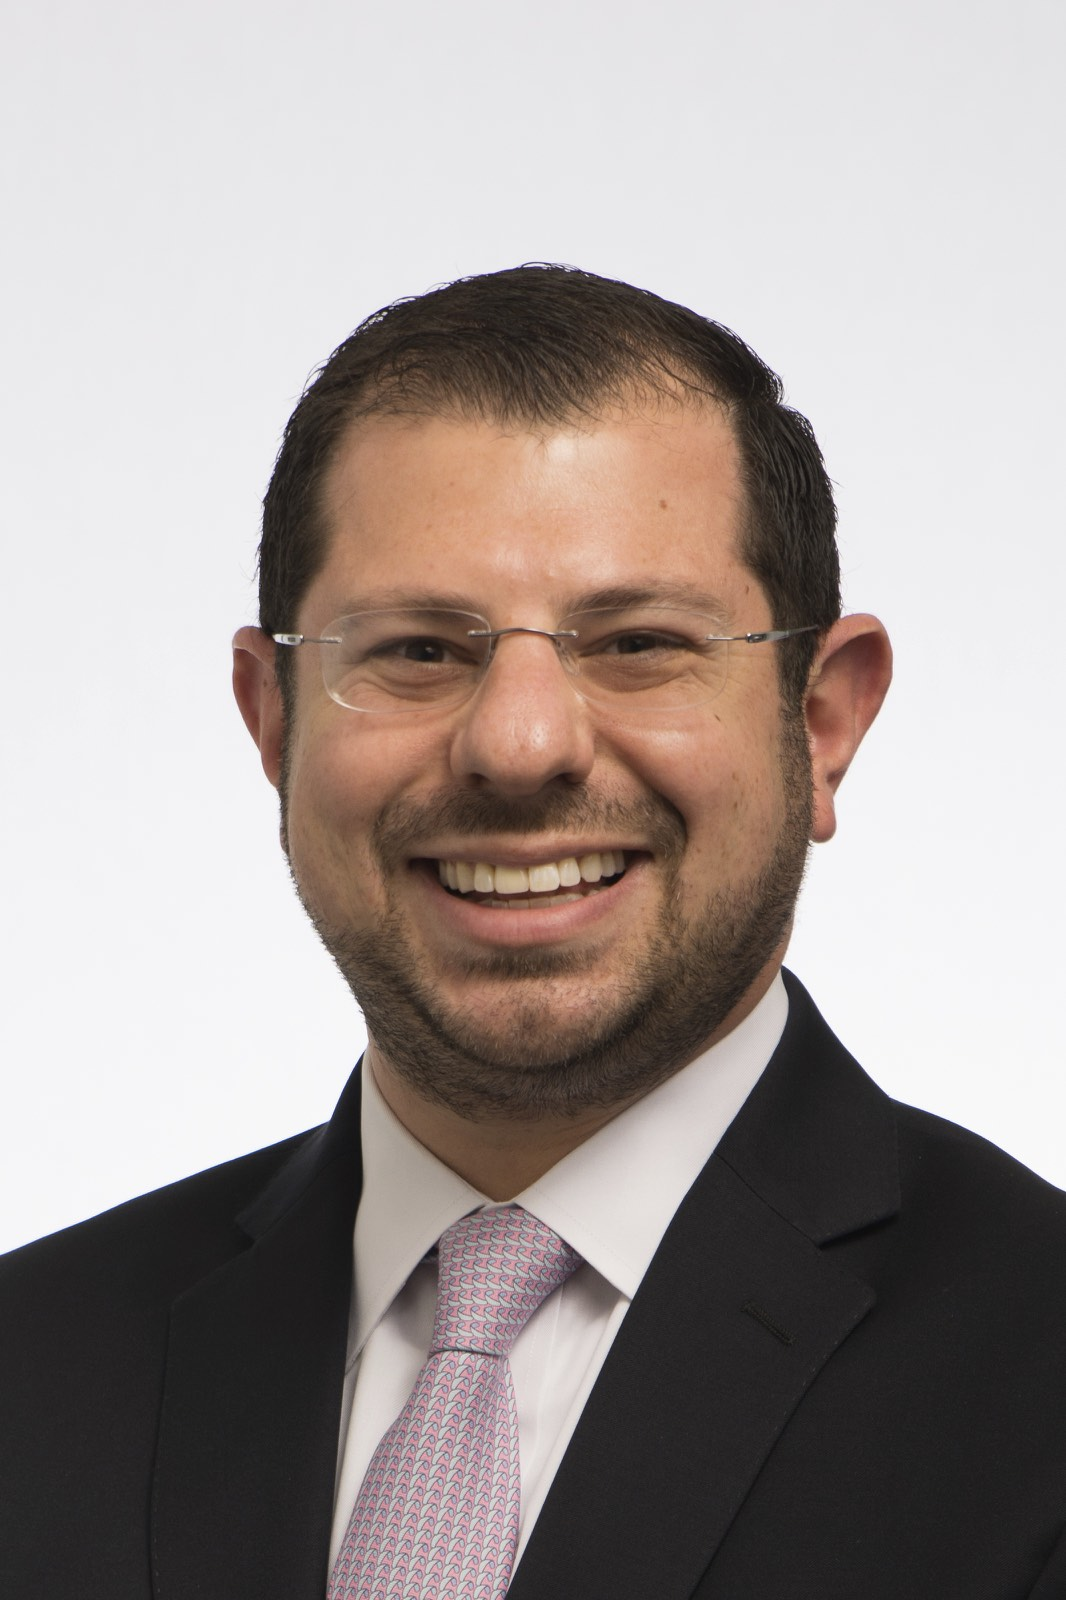 Jordan Shapiro - Sr Managing Director, Financial Services